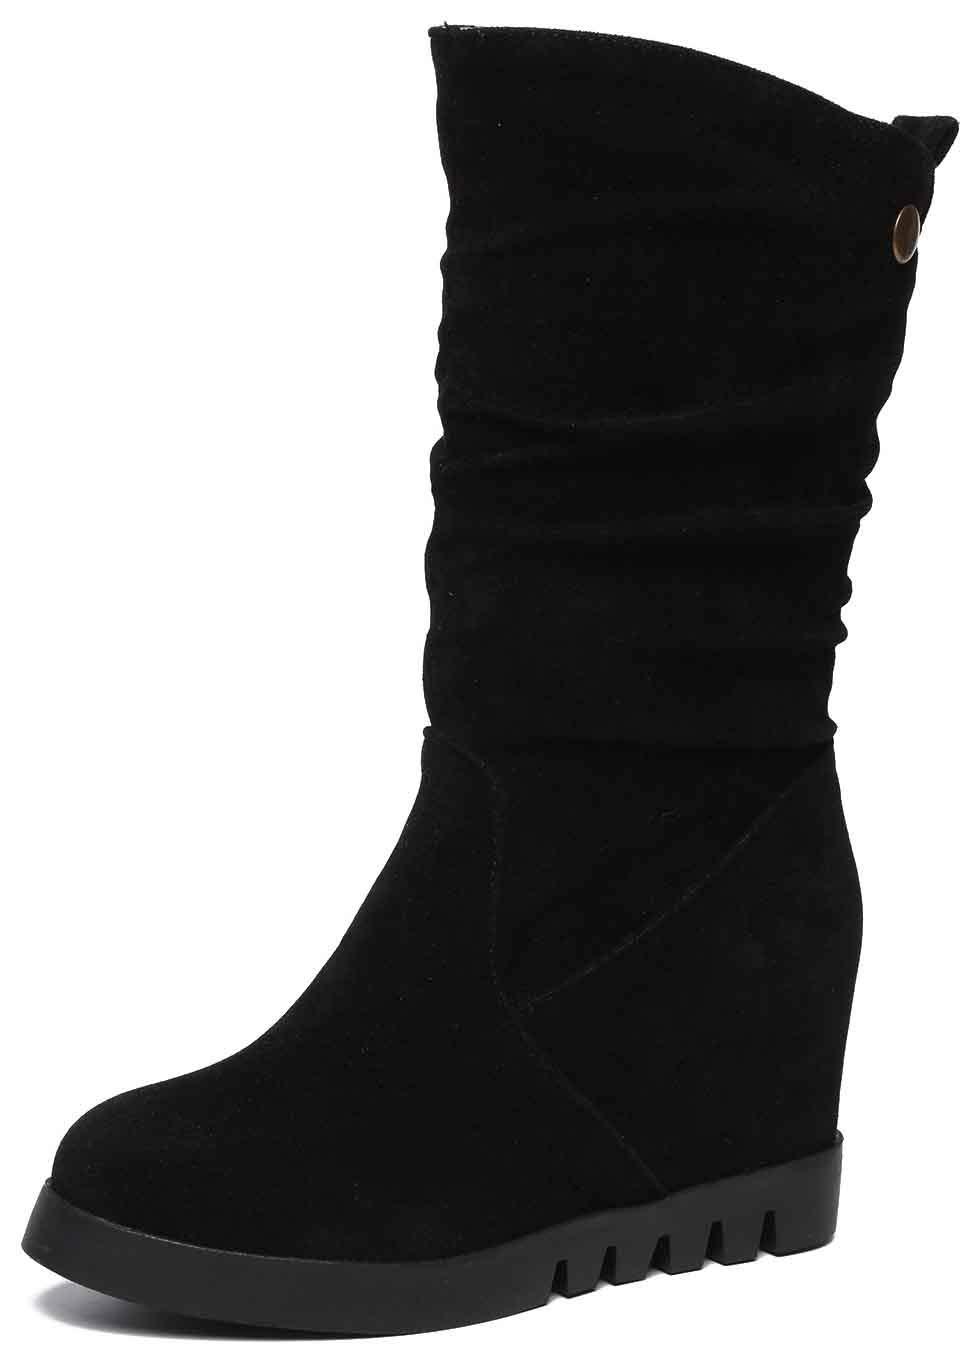 Aisun Women's Dressy Ruffled Mid Calf Boots - Trendy Platform Round Toe Pull On - Hidden Wedge Lug Sole (Black, 9.5 M US)